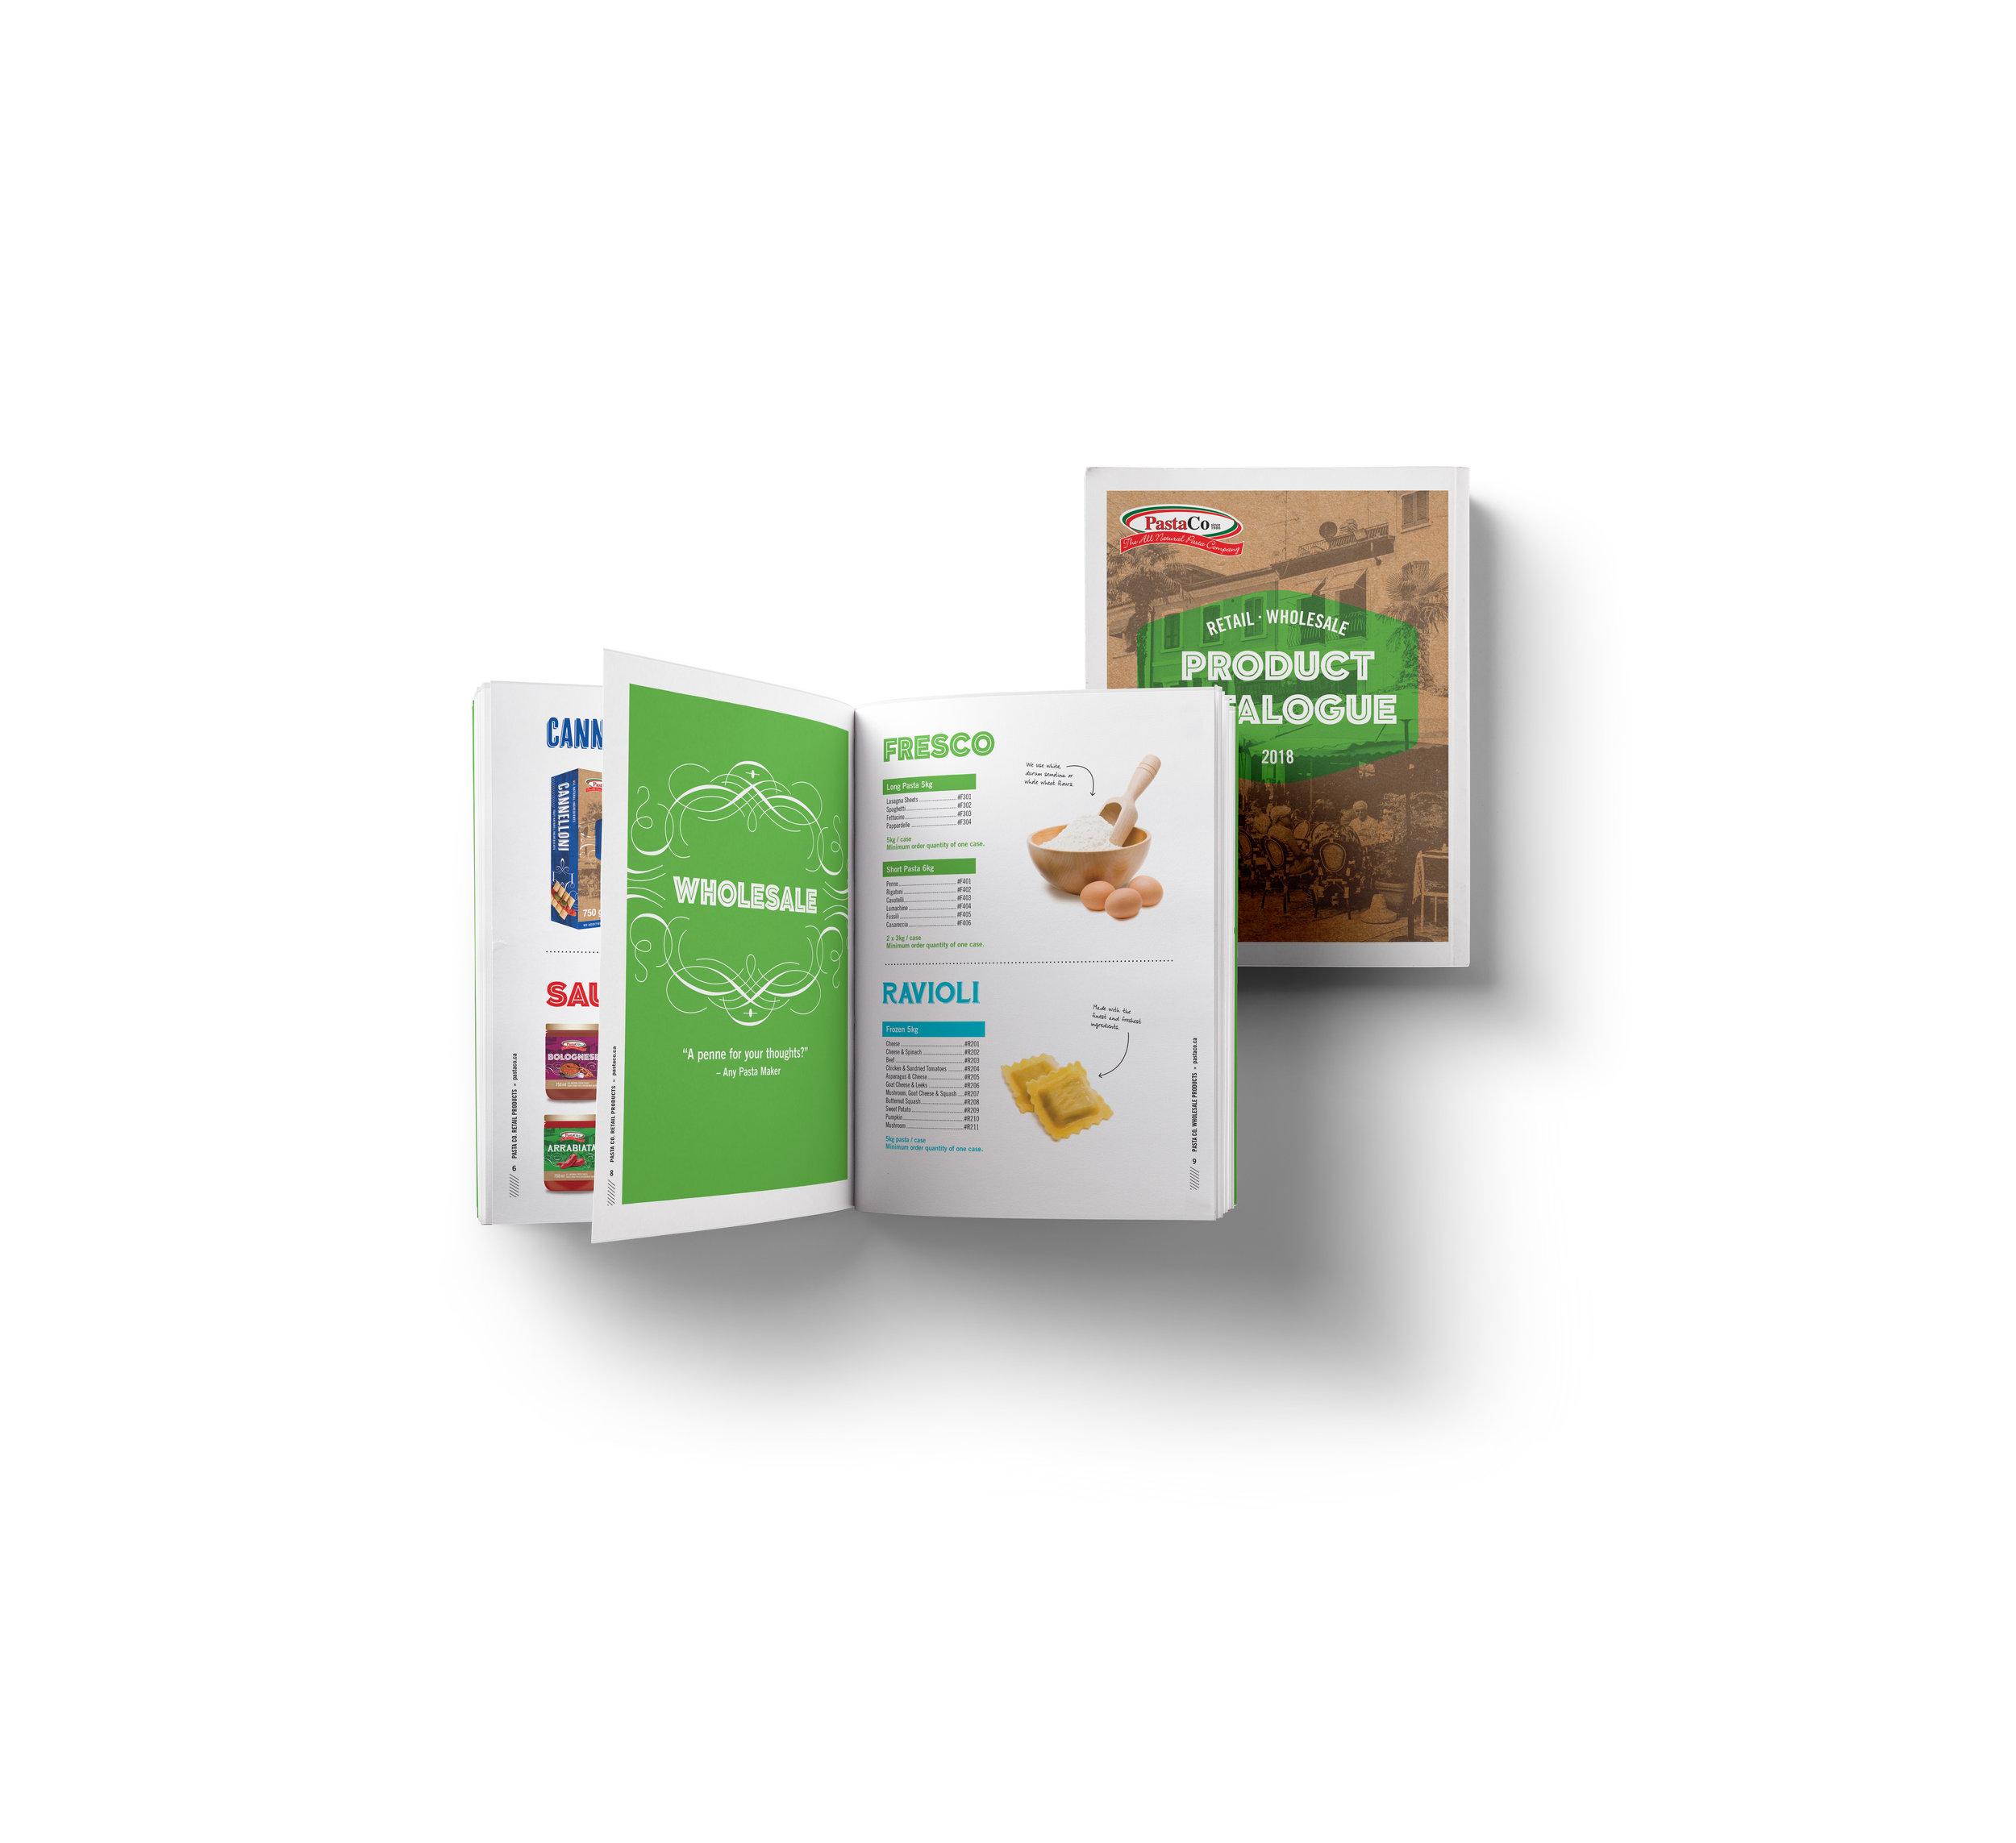 Pasta Co. Catalogue Design